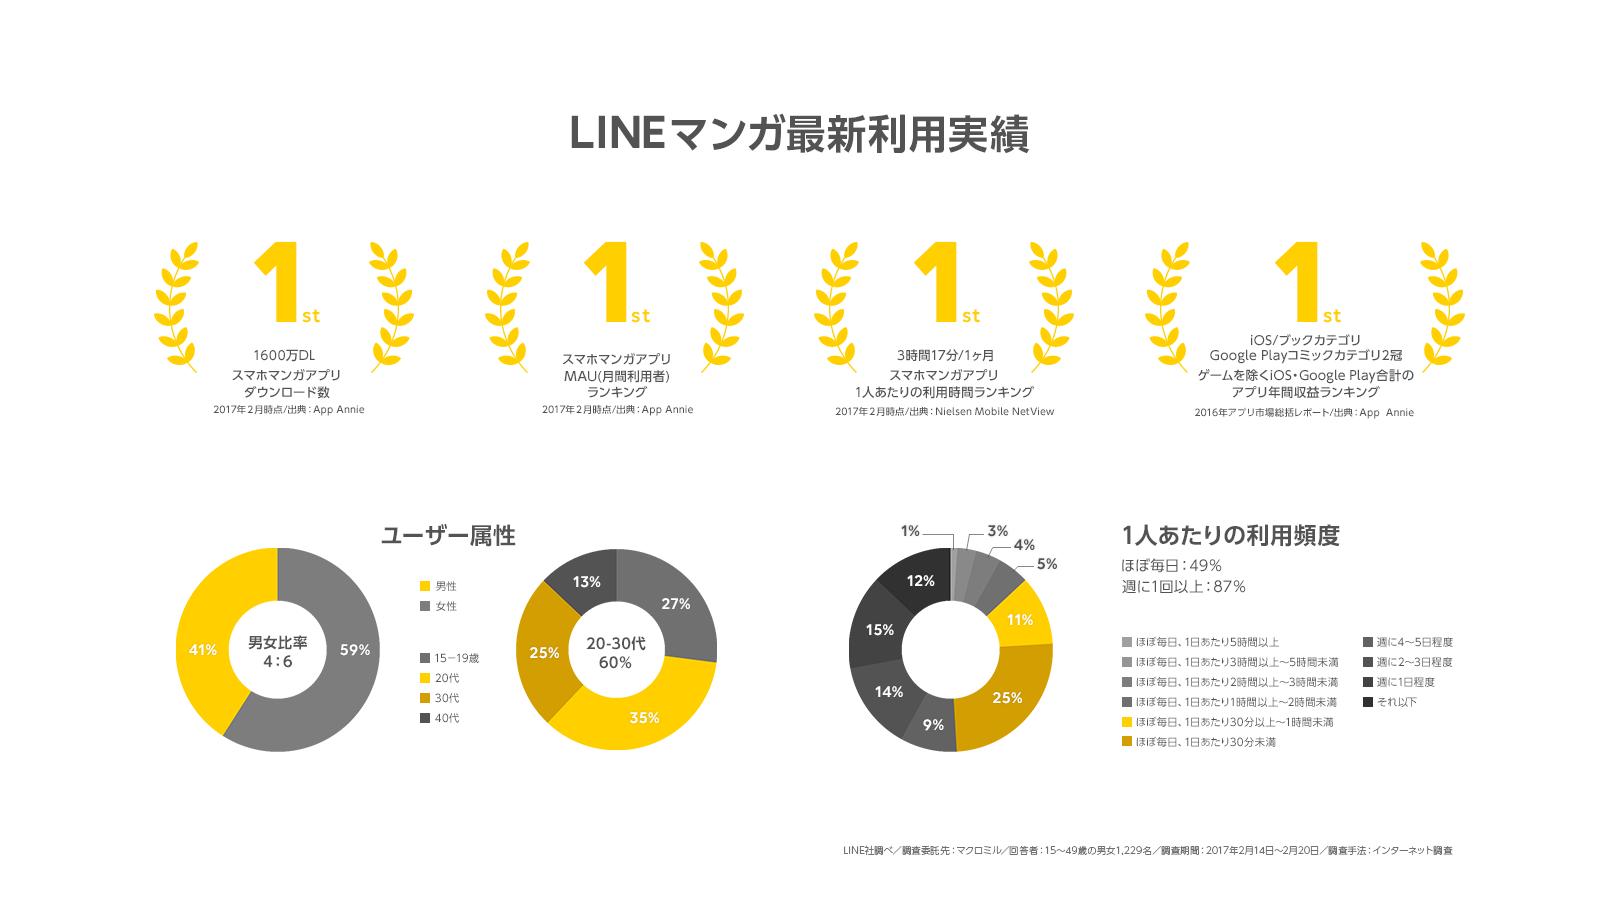 /stf/linecorp/ja/pr/n_4th_graph.png